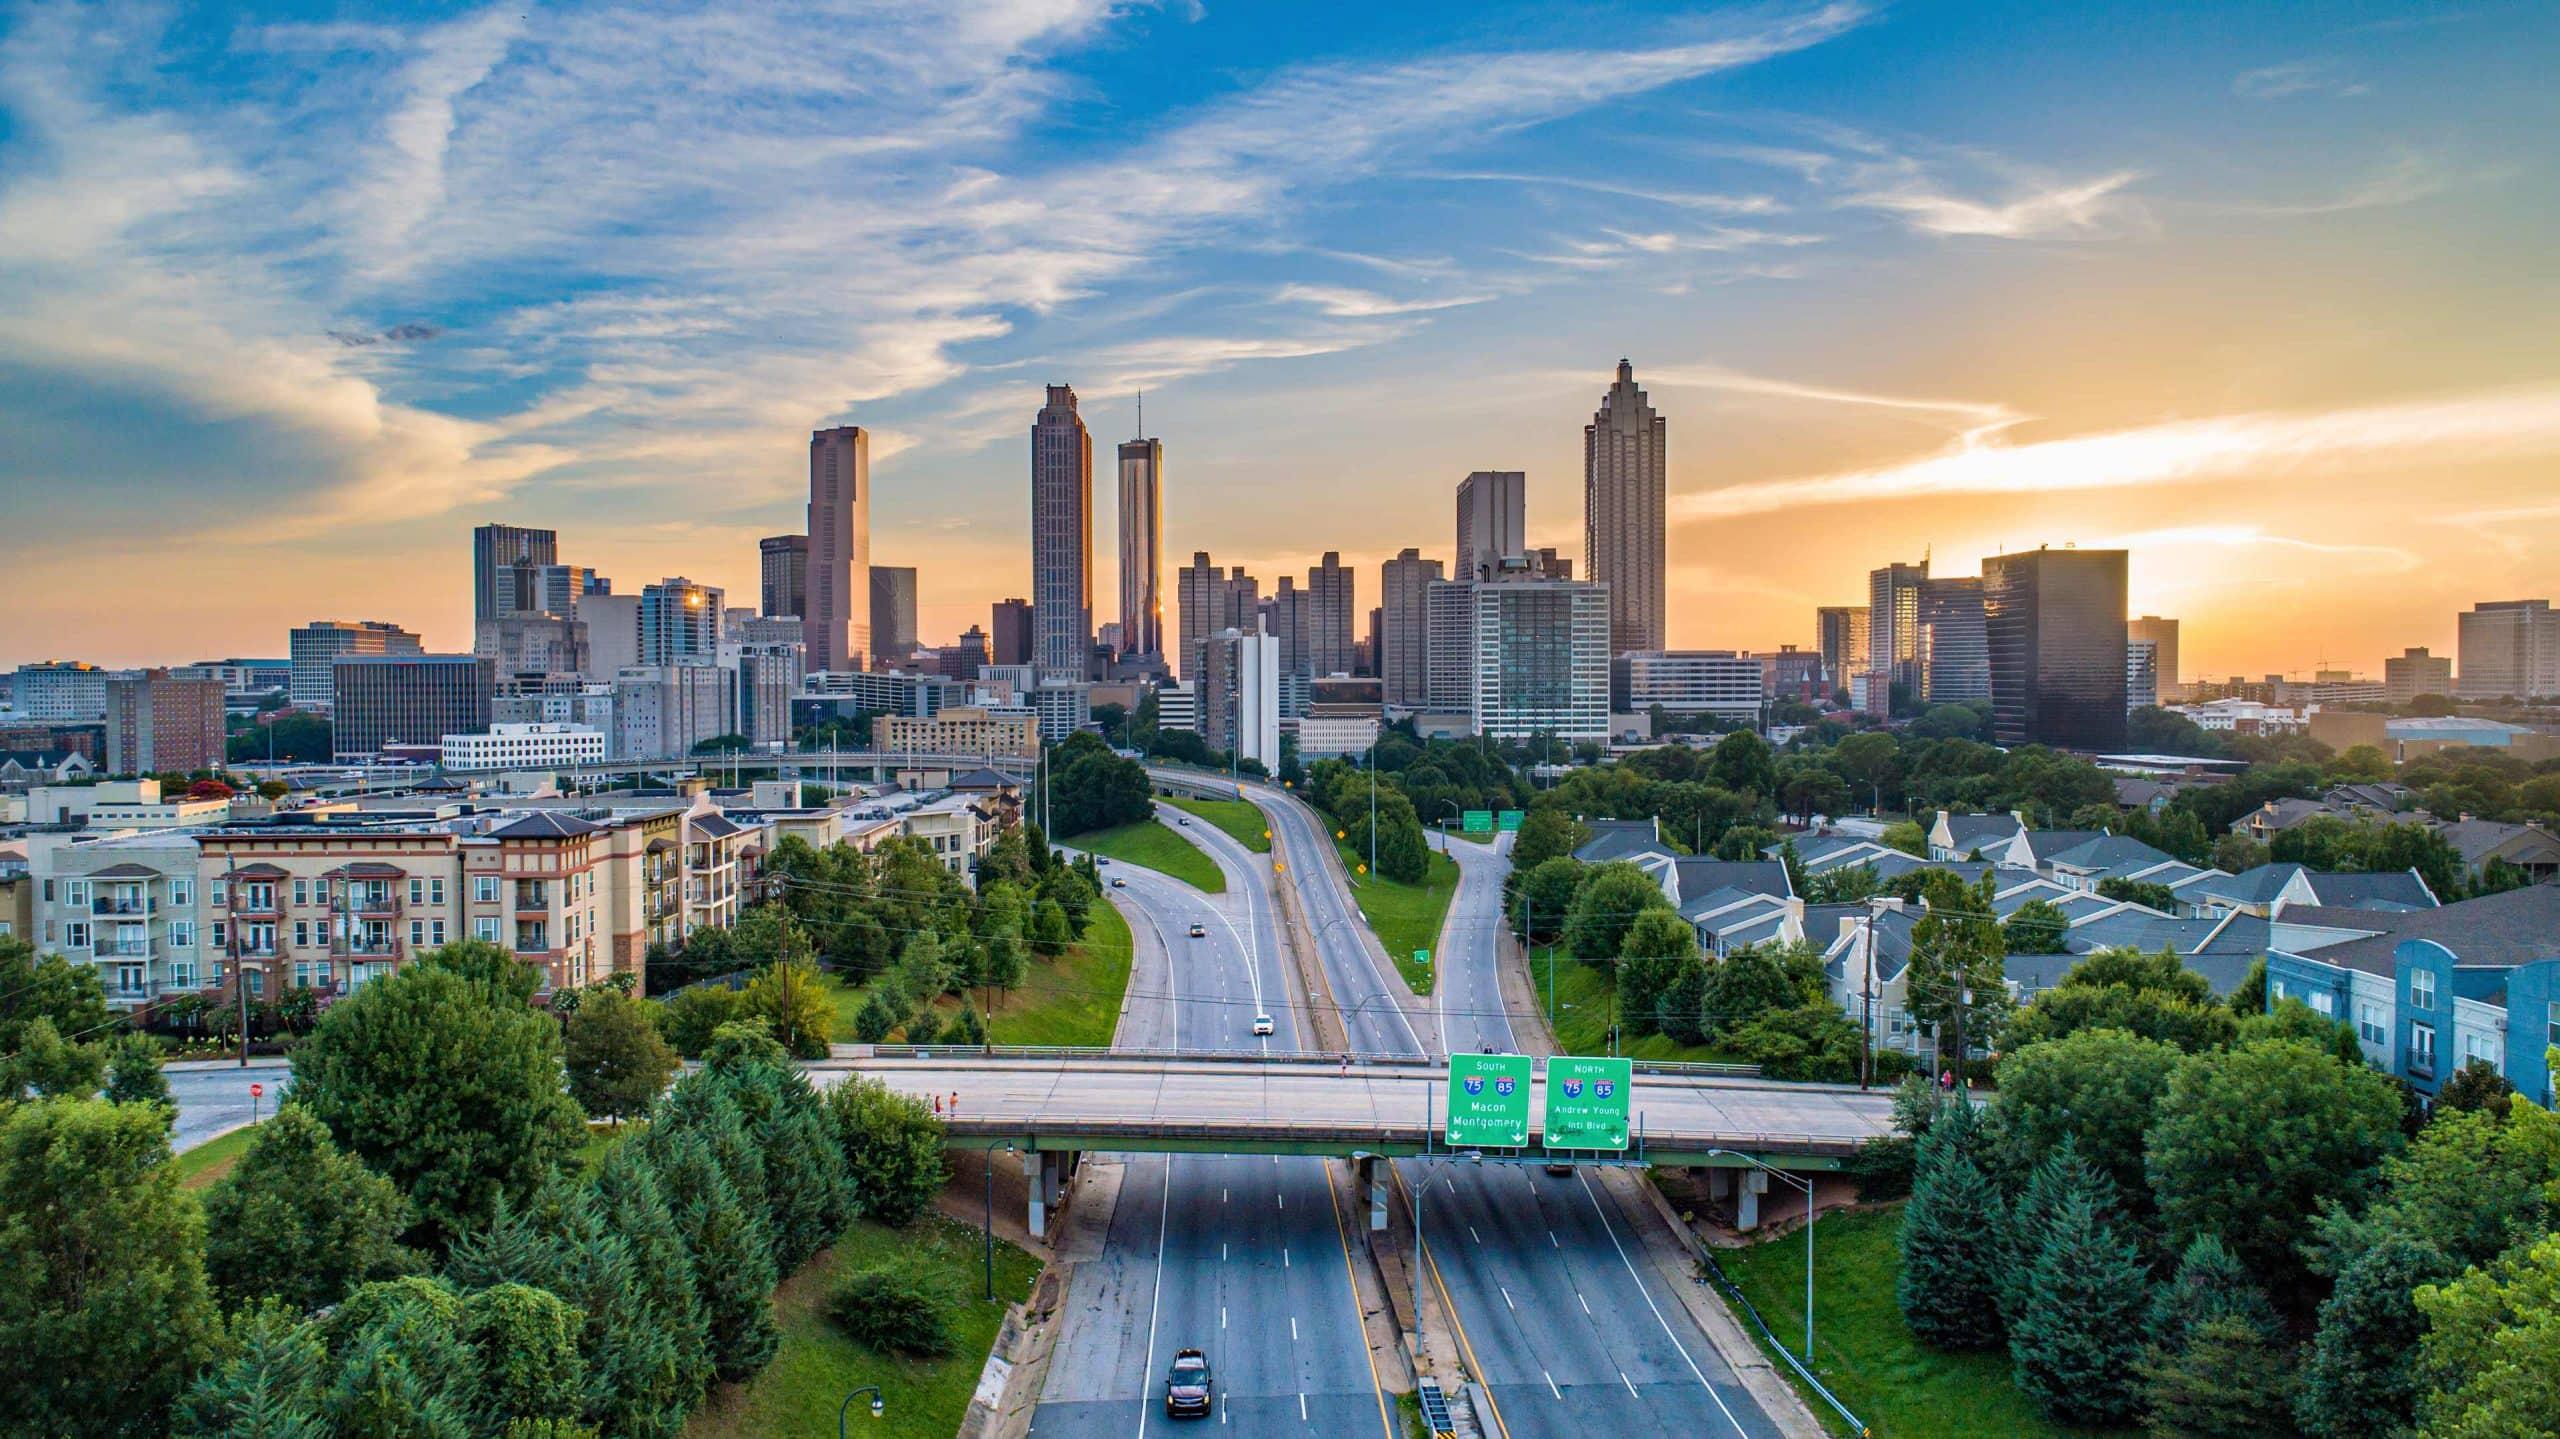 Dr. George Andrews, DDS in Atlanta, GA